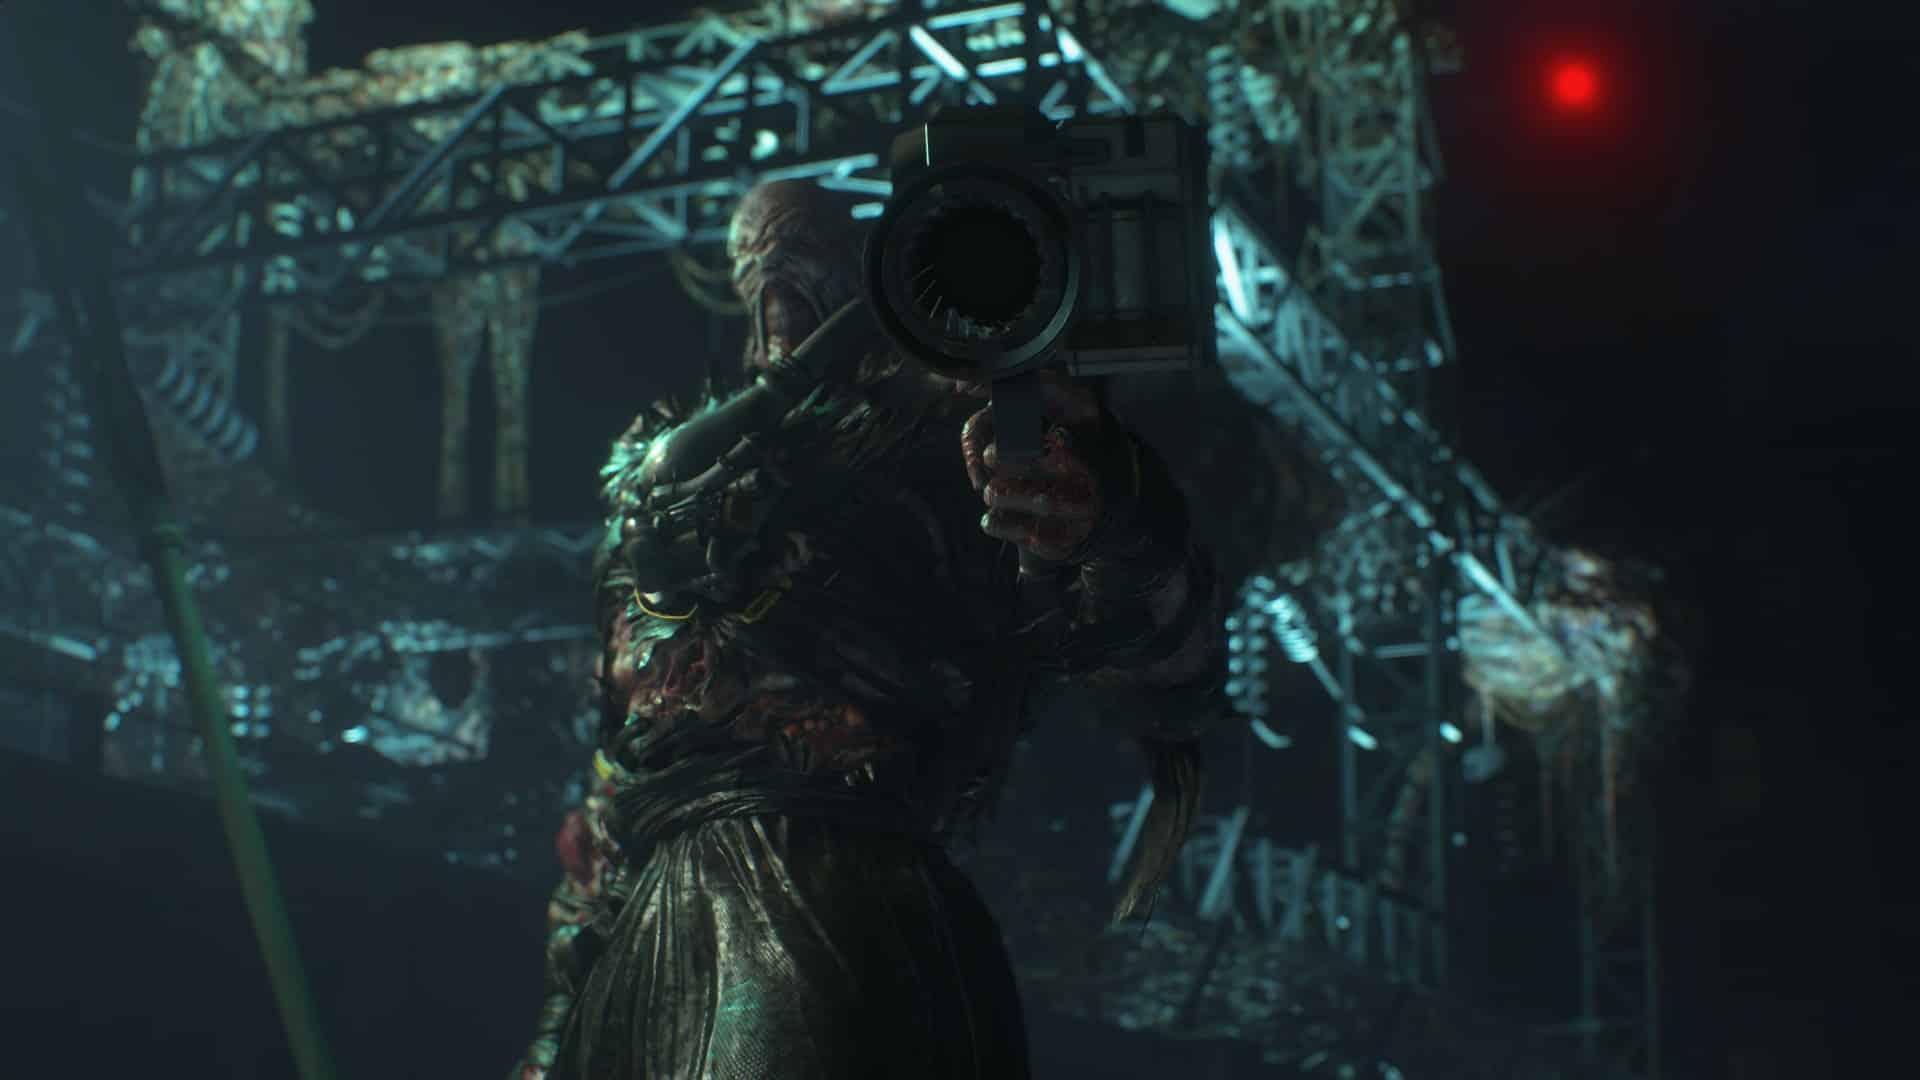 Sony PlayStation 1 renaissance resurgence PS1 classics video games Capcom resident evil 3 remake nemesis